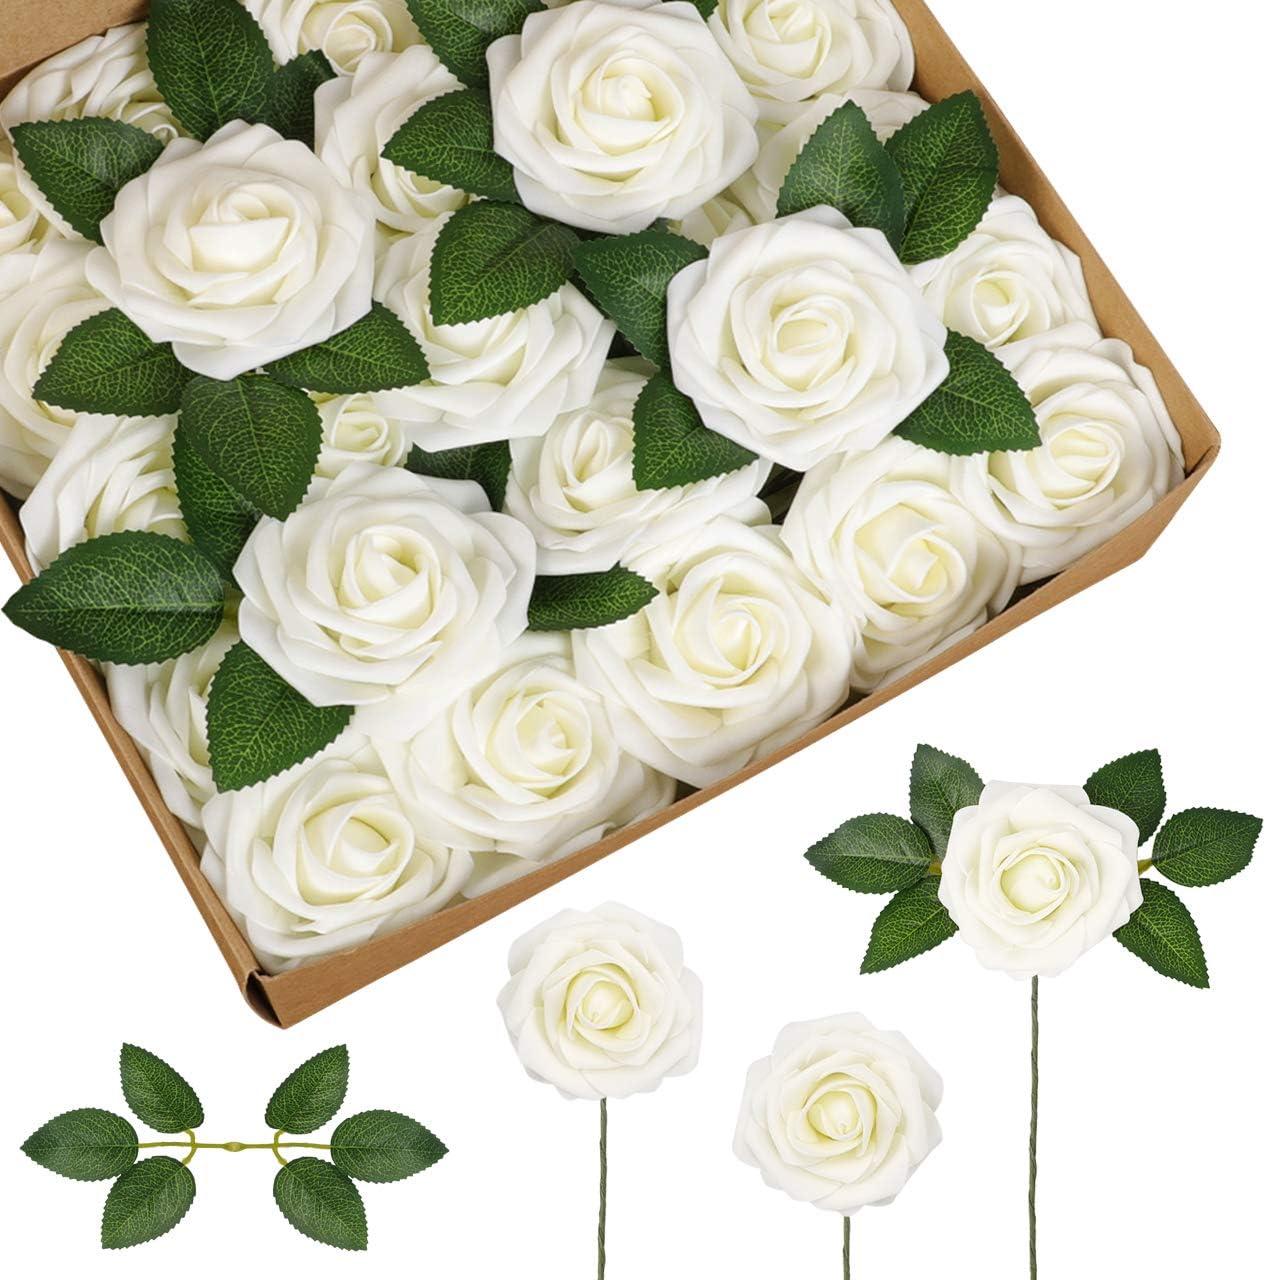 InnoGear Artificial Flowers, 50 Pcs Faux Flowers Fake Flowers Ivory Roses Perfect for DIY Wedding Bouquets Centerpieces Bridal Shower Party Home Flower Arrangement Decorations